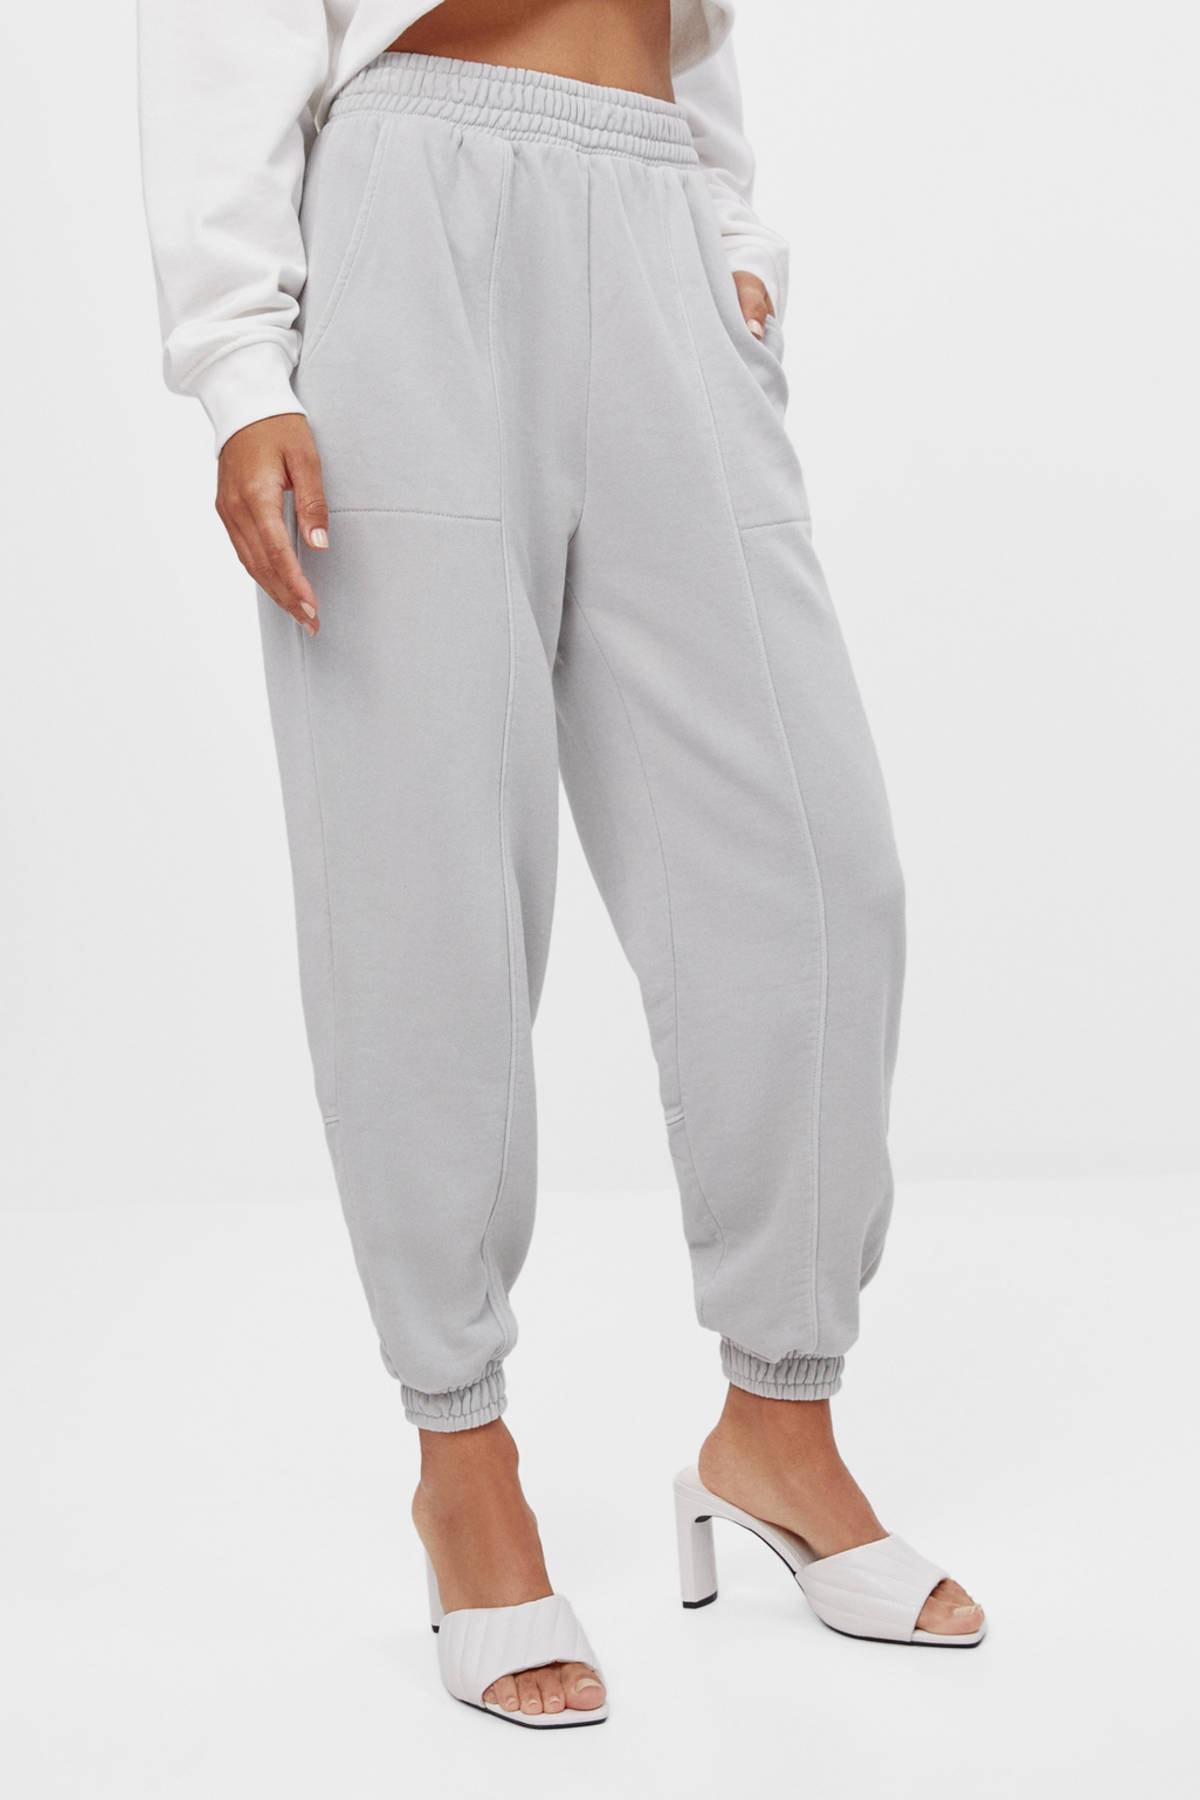 Bershka Kadın Gri Reflektör Jogging Fit Pantolon 1